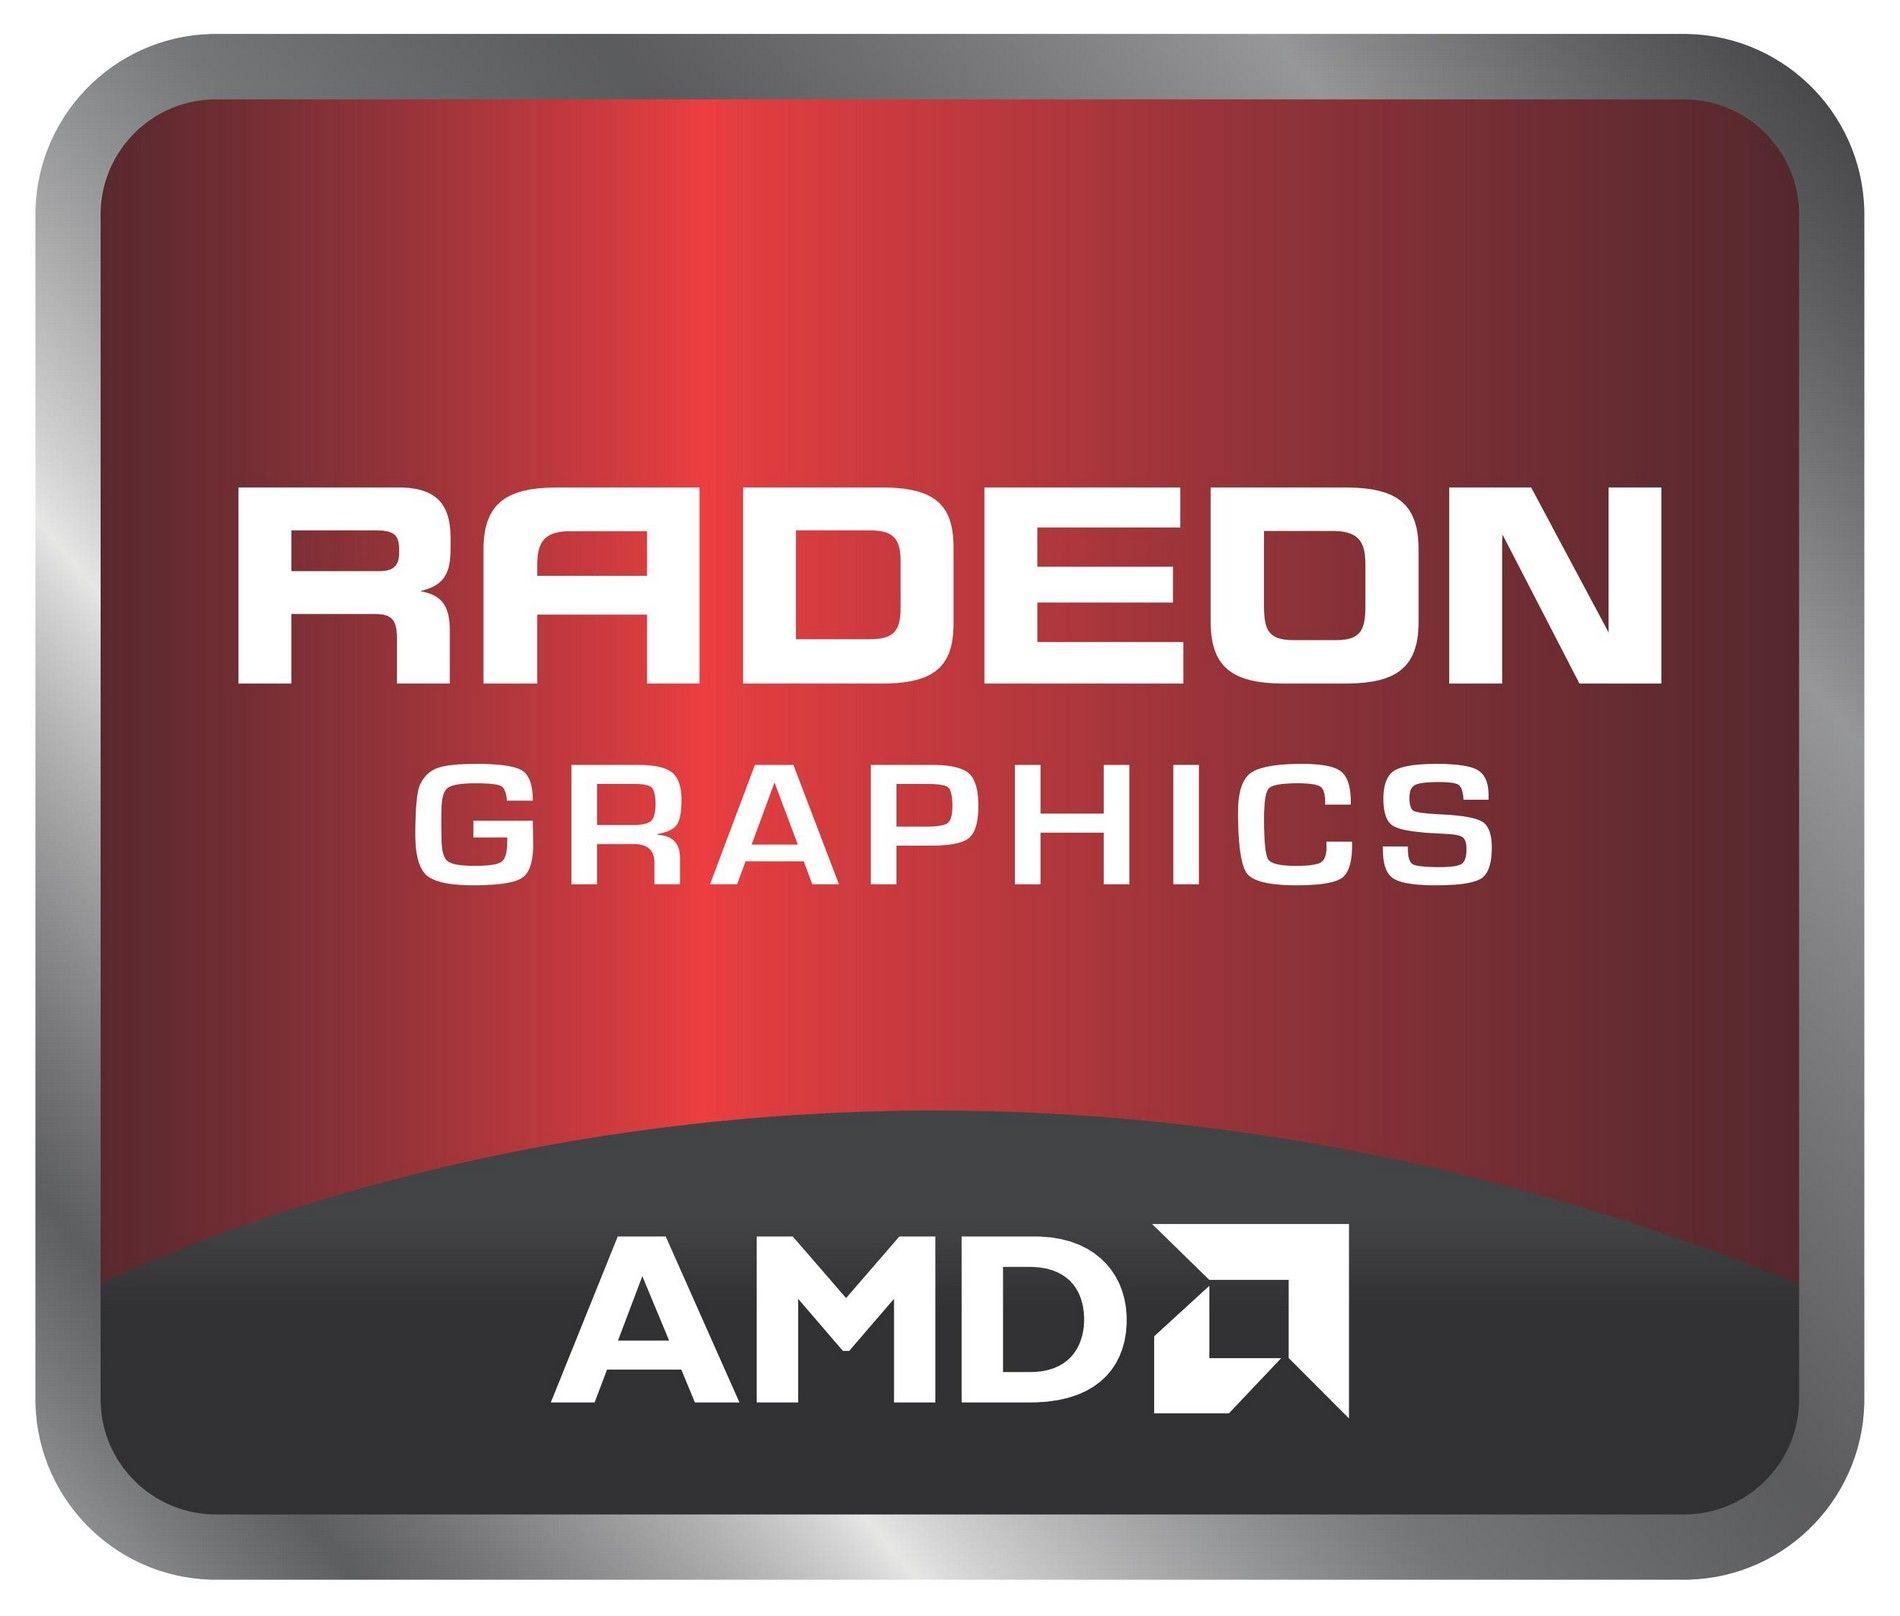 AMD Radeon Graphics Logo Download Vector Graphic card